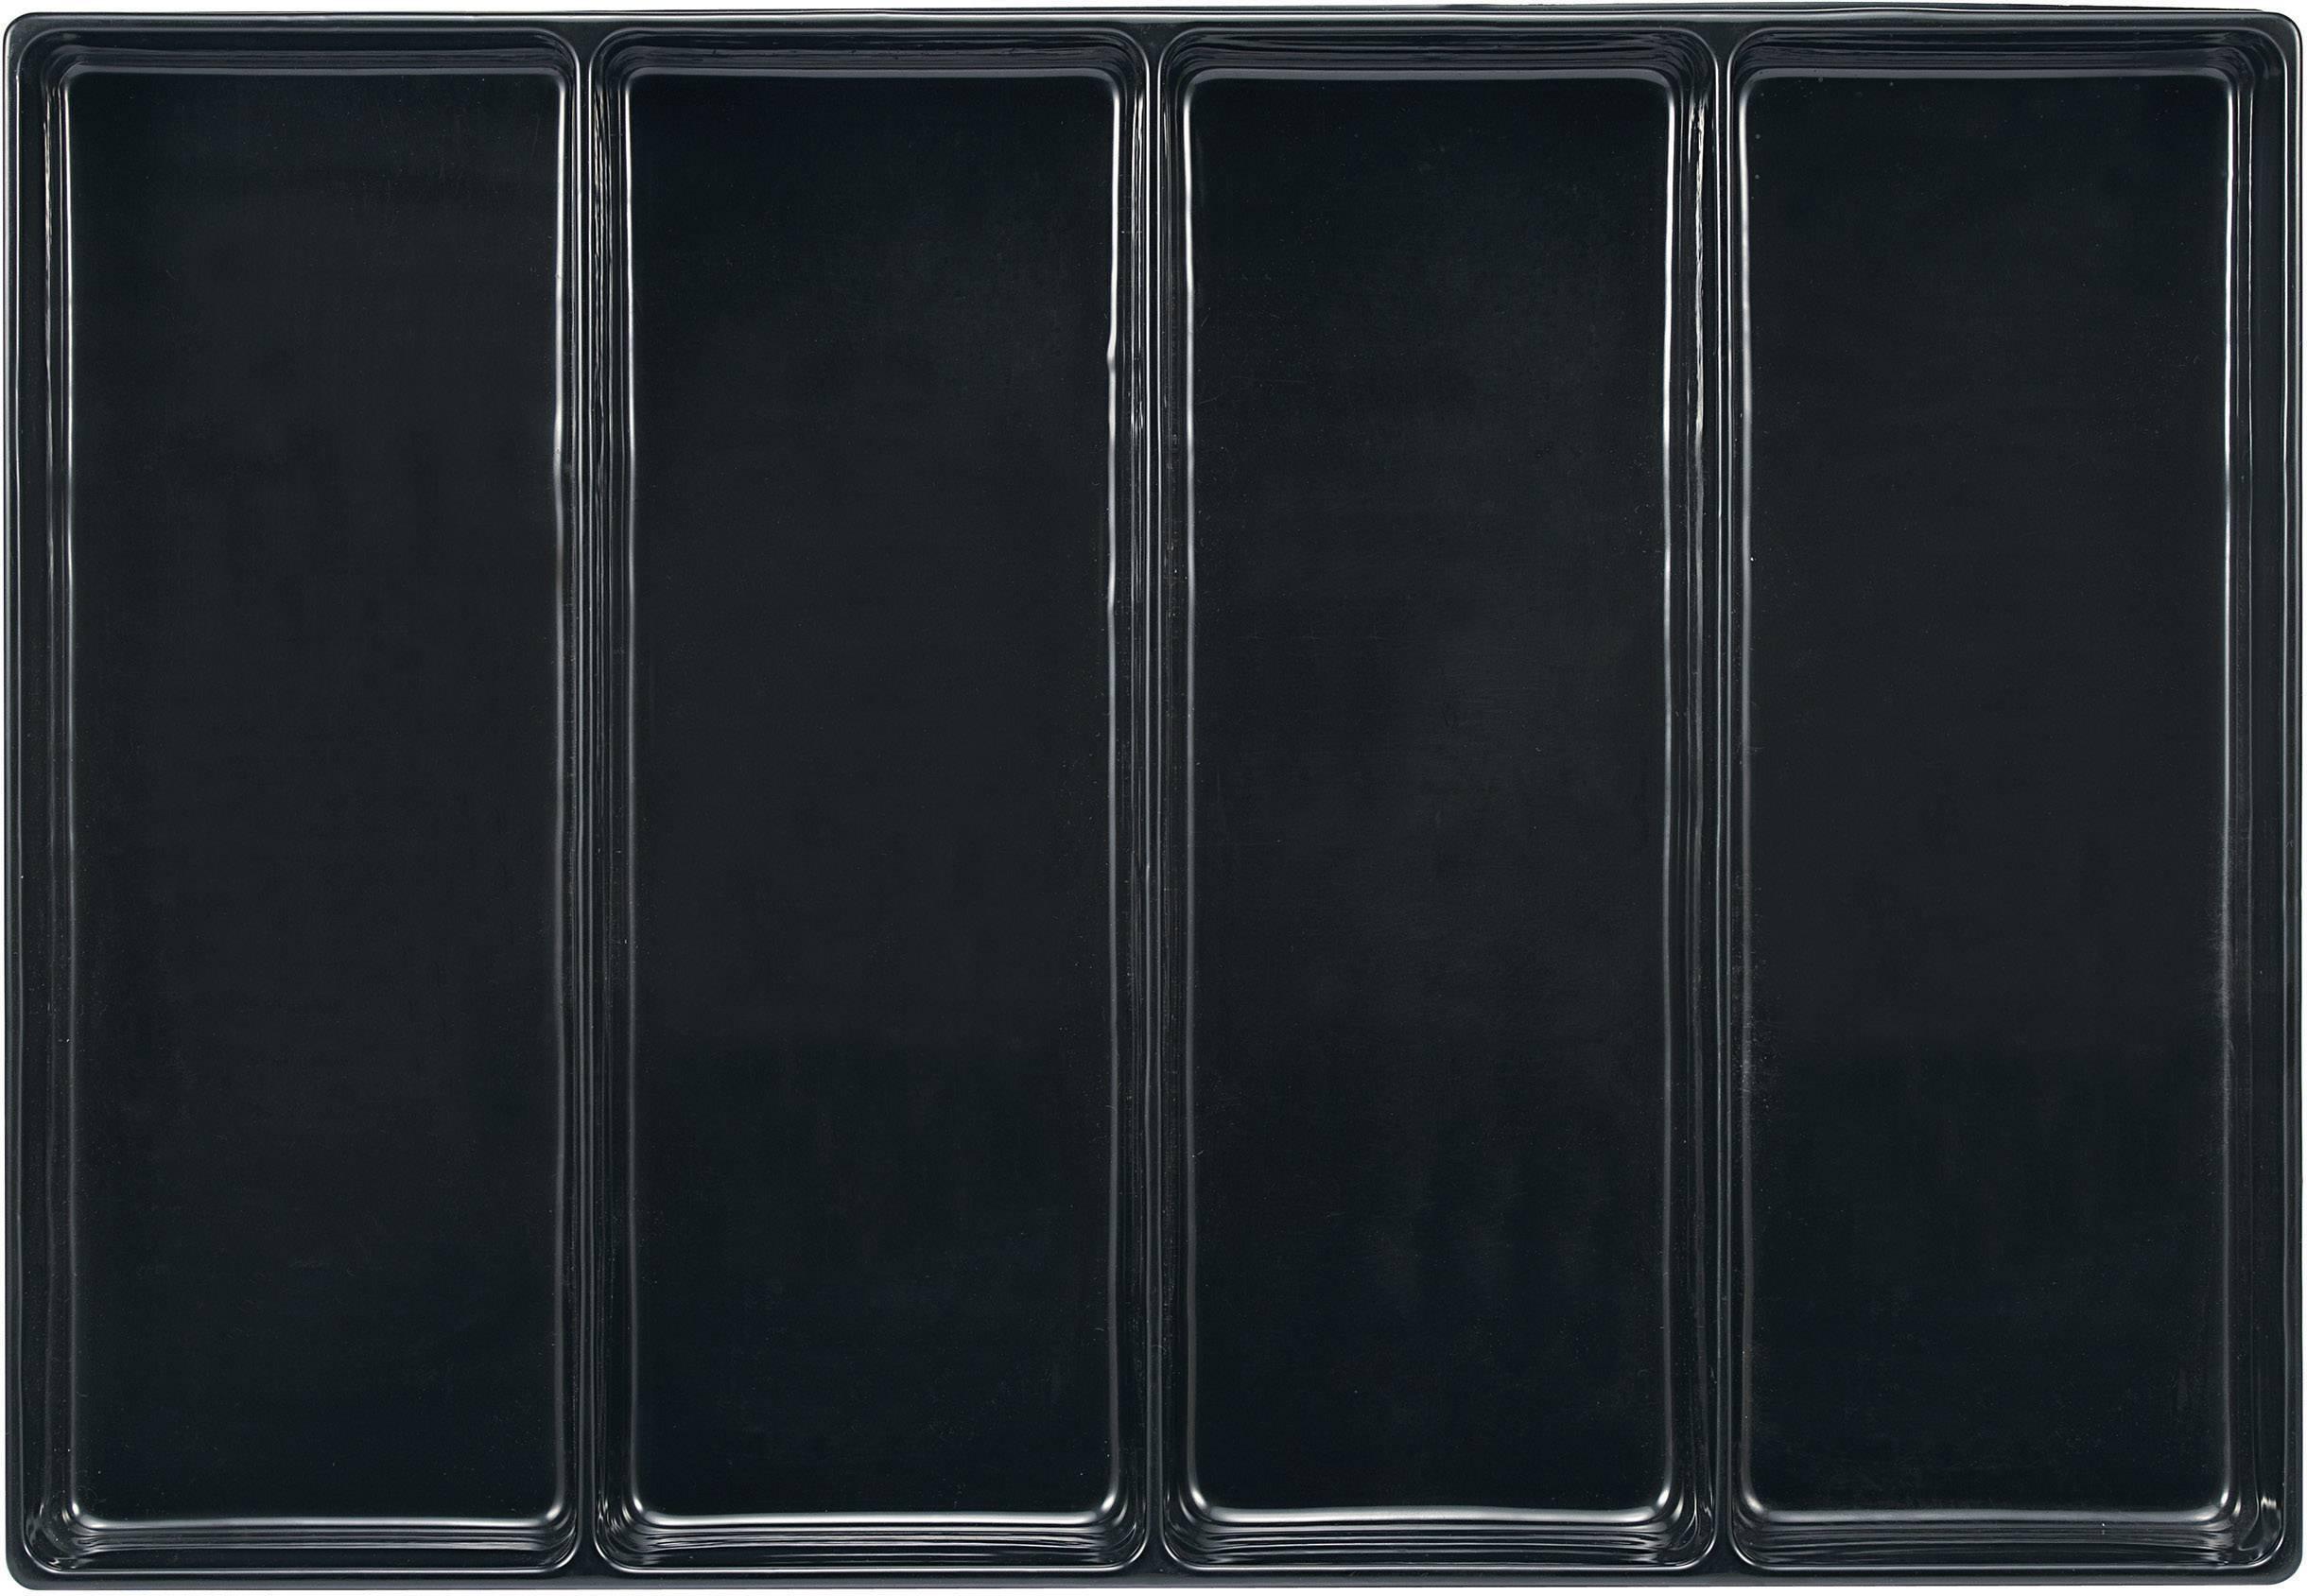 Zásuvky s 4 přihrádkami TOOLCRAFT 96029C701, rozměry:(d x š x v) 570 x 392 x 50 mm